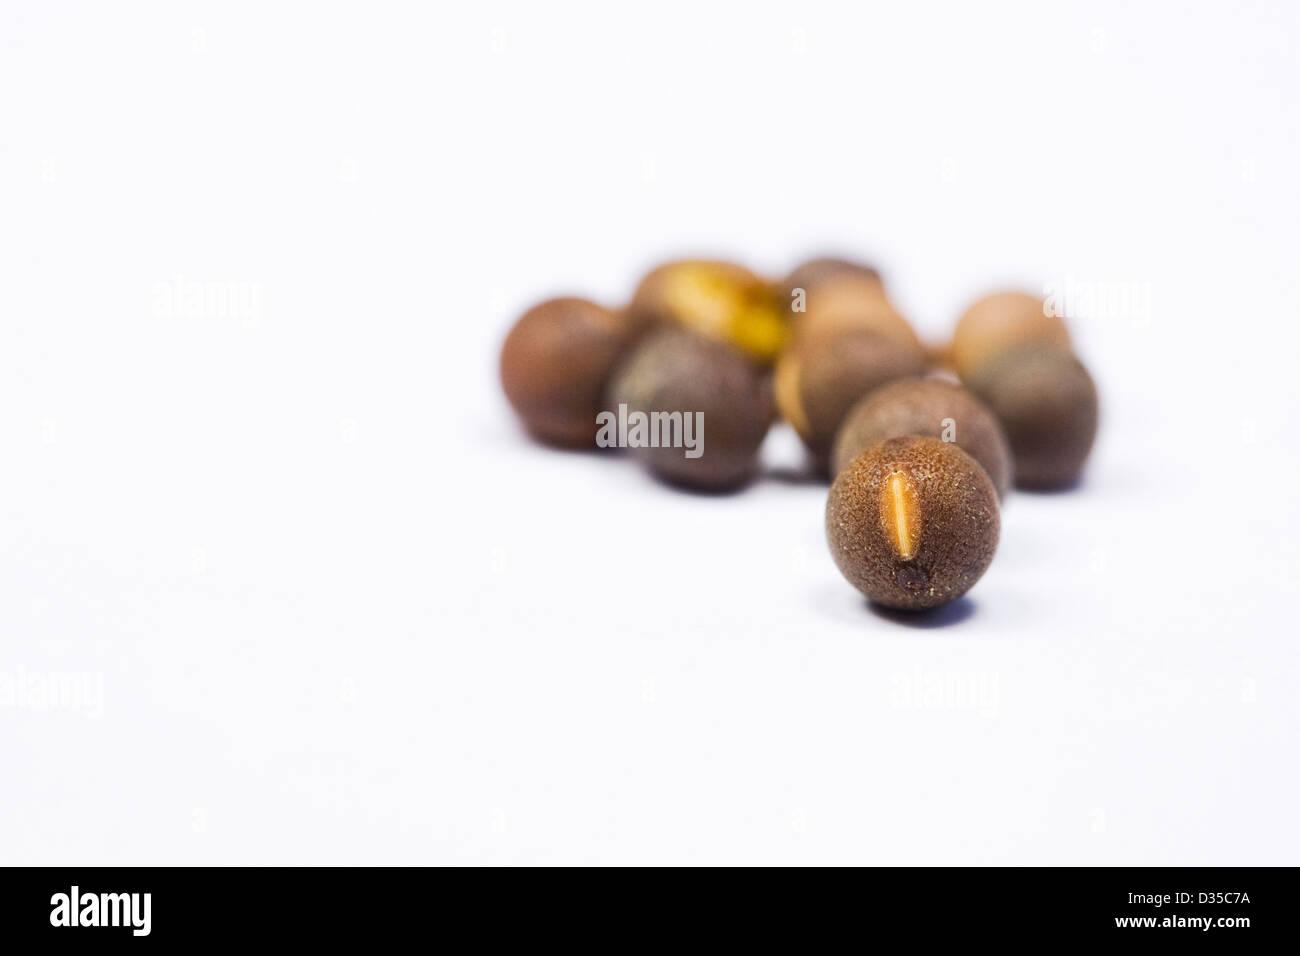 Lathyrus fragrantissima. Sweet pea seeds on a white background. - Stock Image